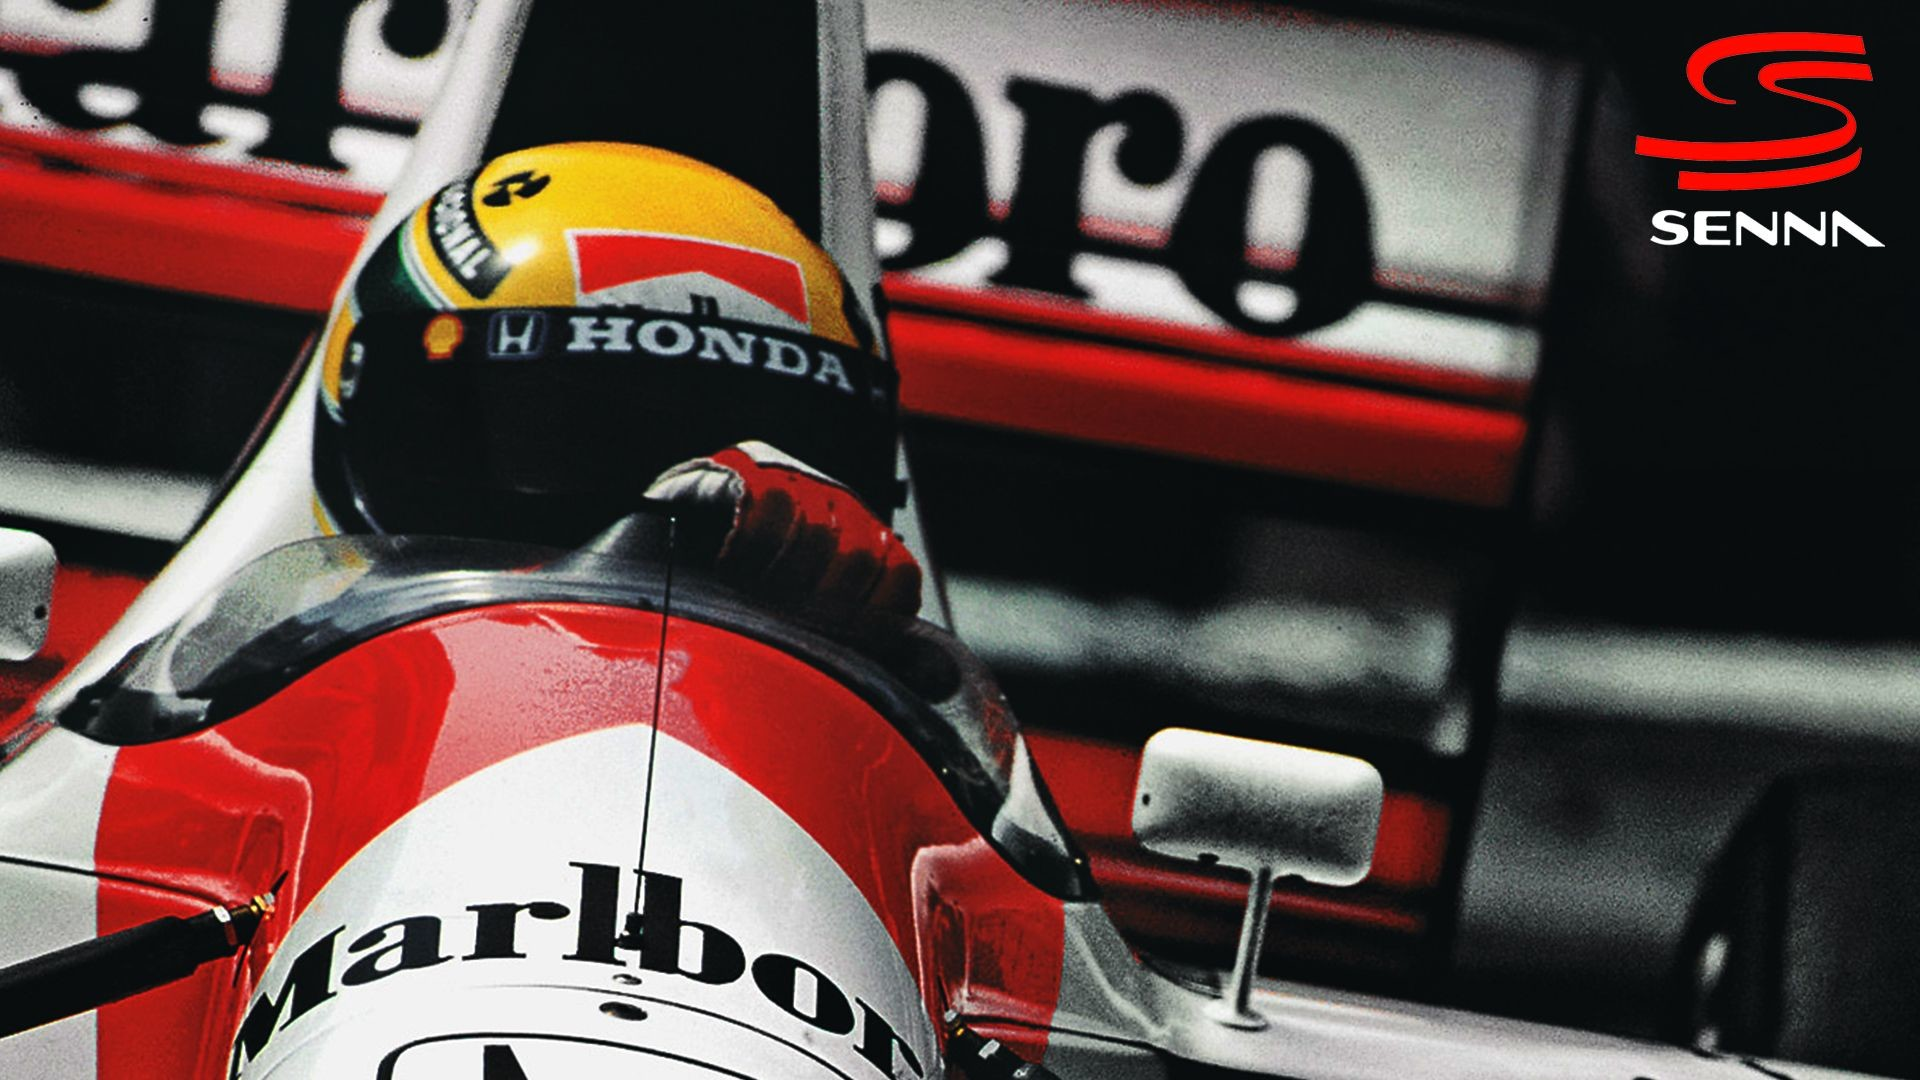 Hd Wallpaper For Desktop With Quotes Ayrton Senna Wallpaper 74 Images